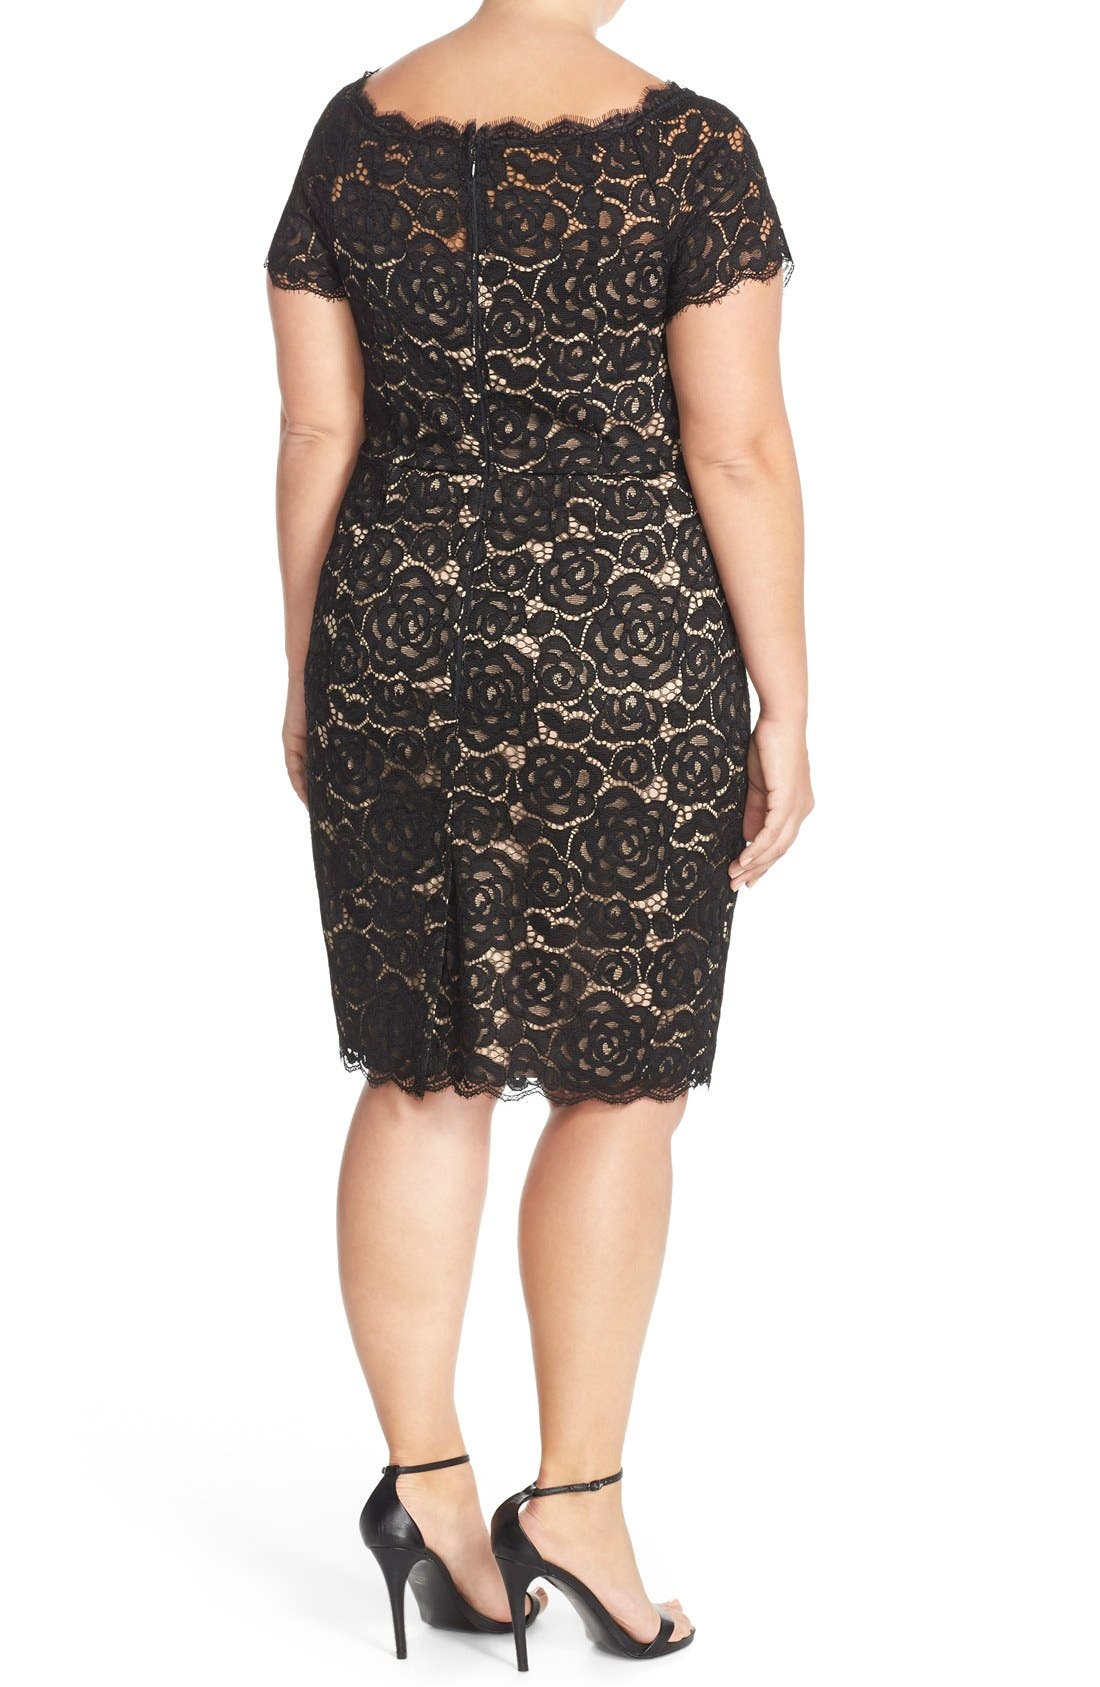 Off the Shoulder Lace Sheath Dress,                             Alternate thumbnail 4, color,                             BLACK/ NUDE